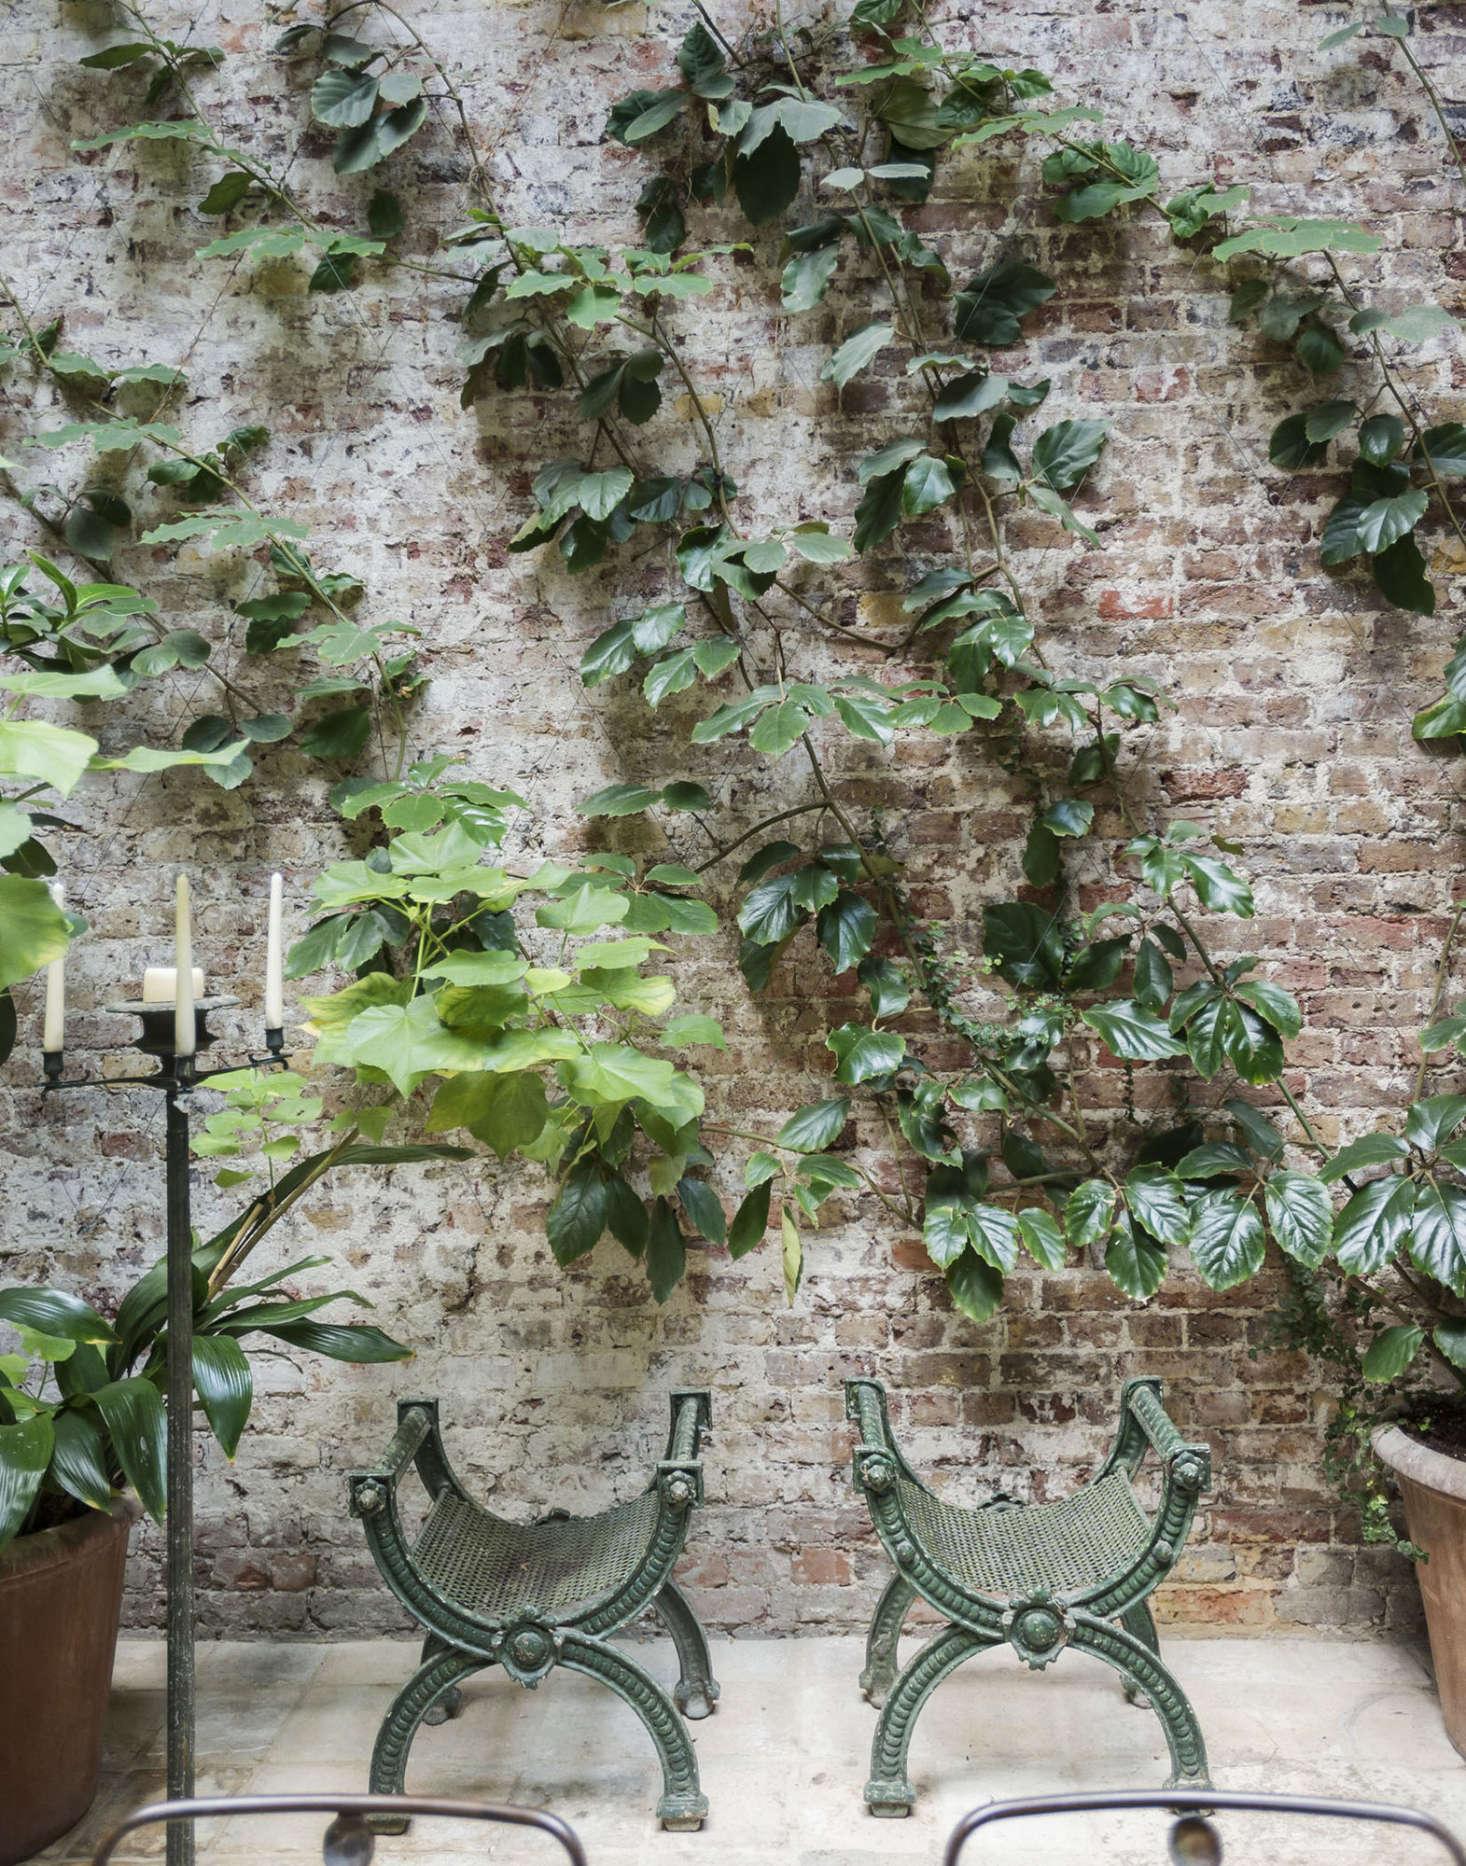 Oak-leaf ivy (Cissus rhombolia) is a vine that prefers low light.